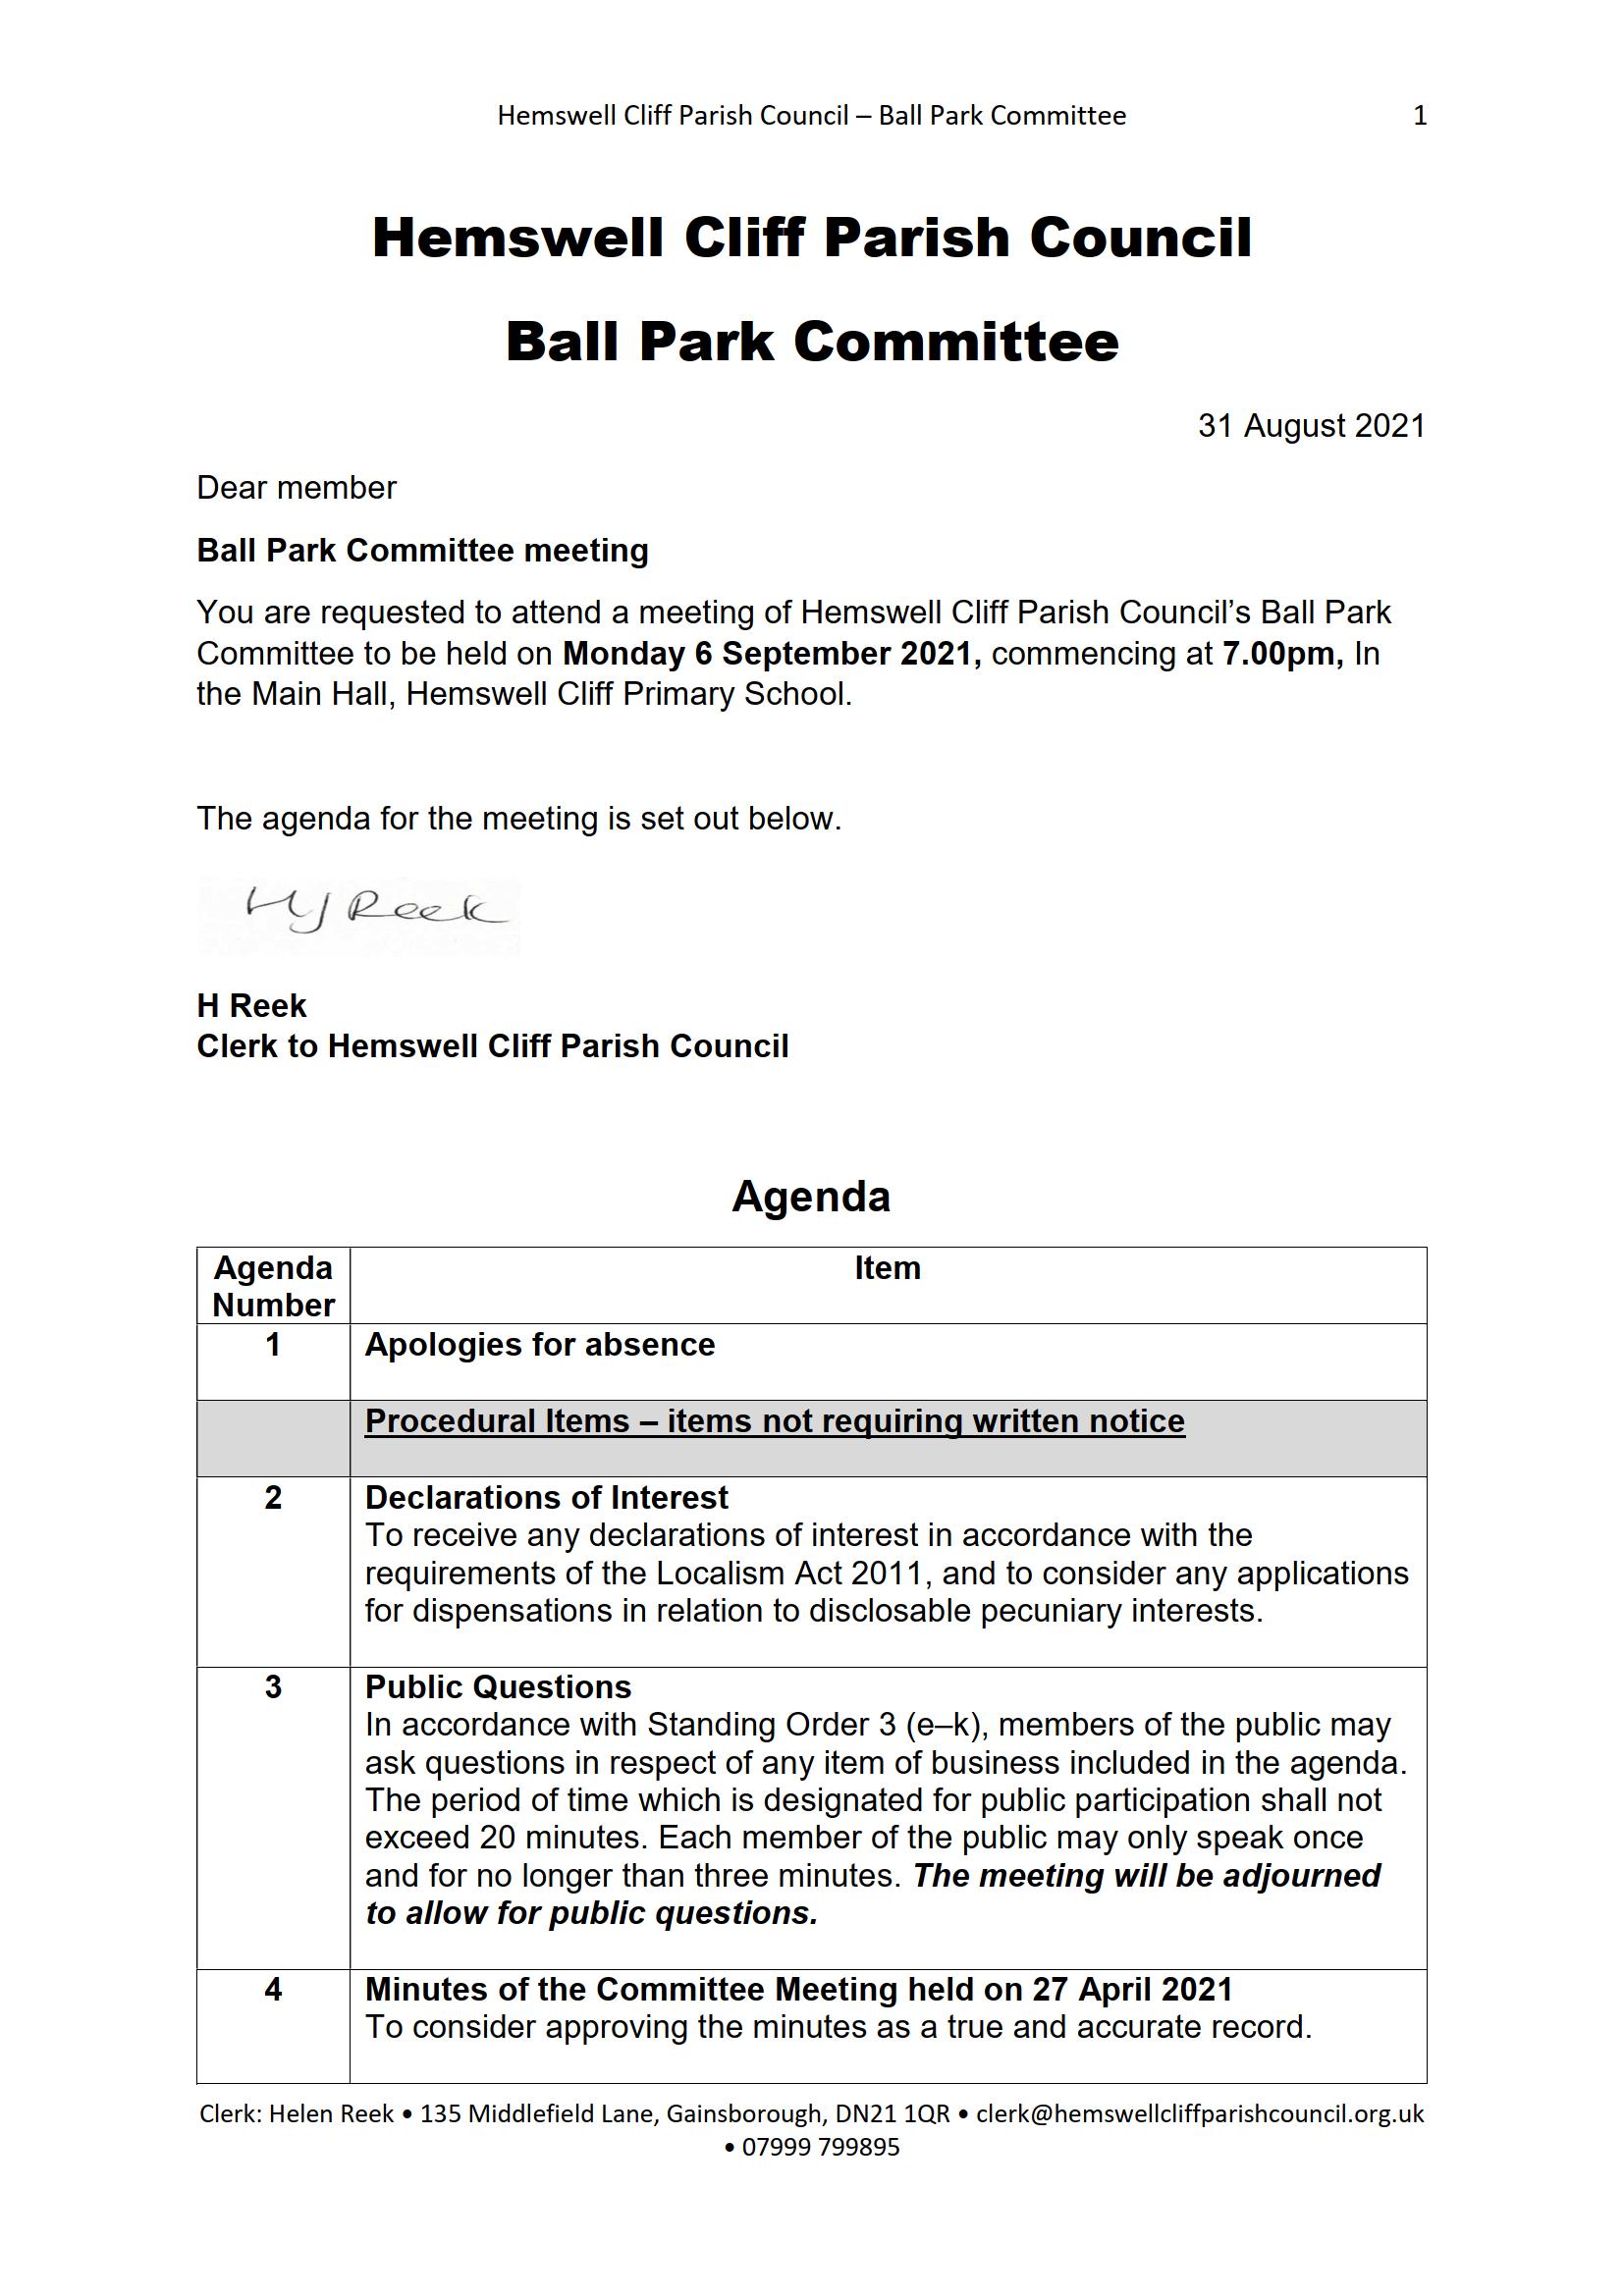 HCPC_BallPark_Agenda_06.09.21_1.png